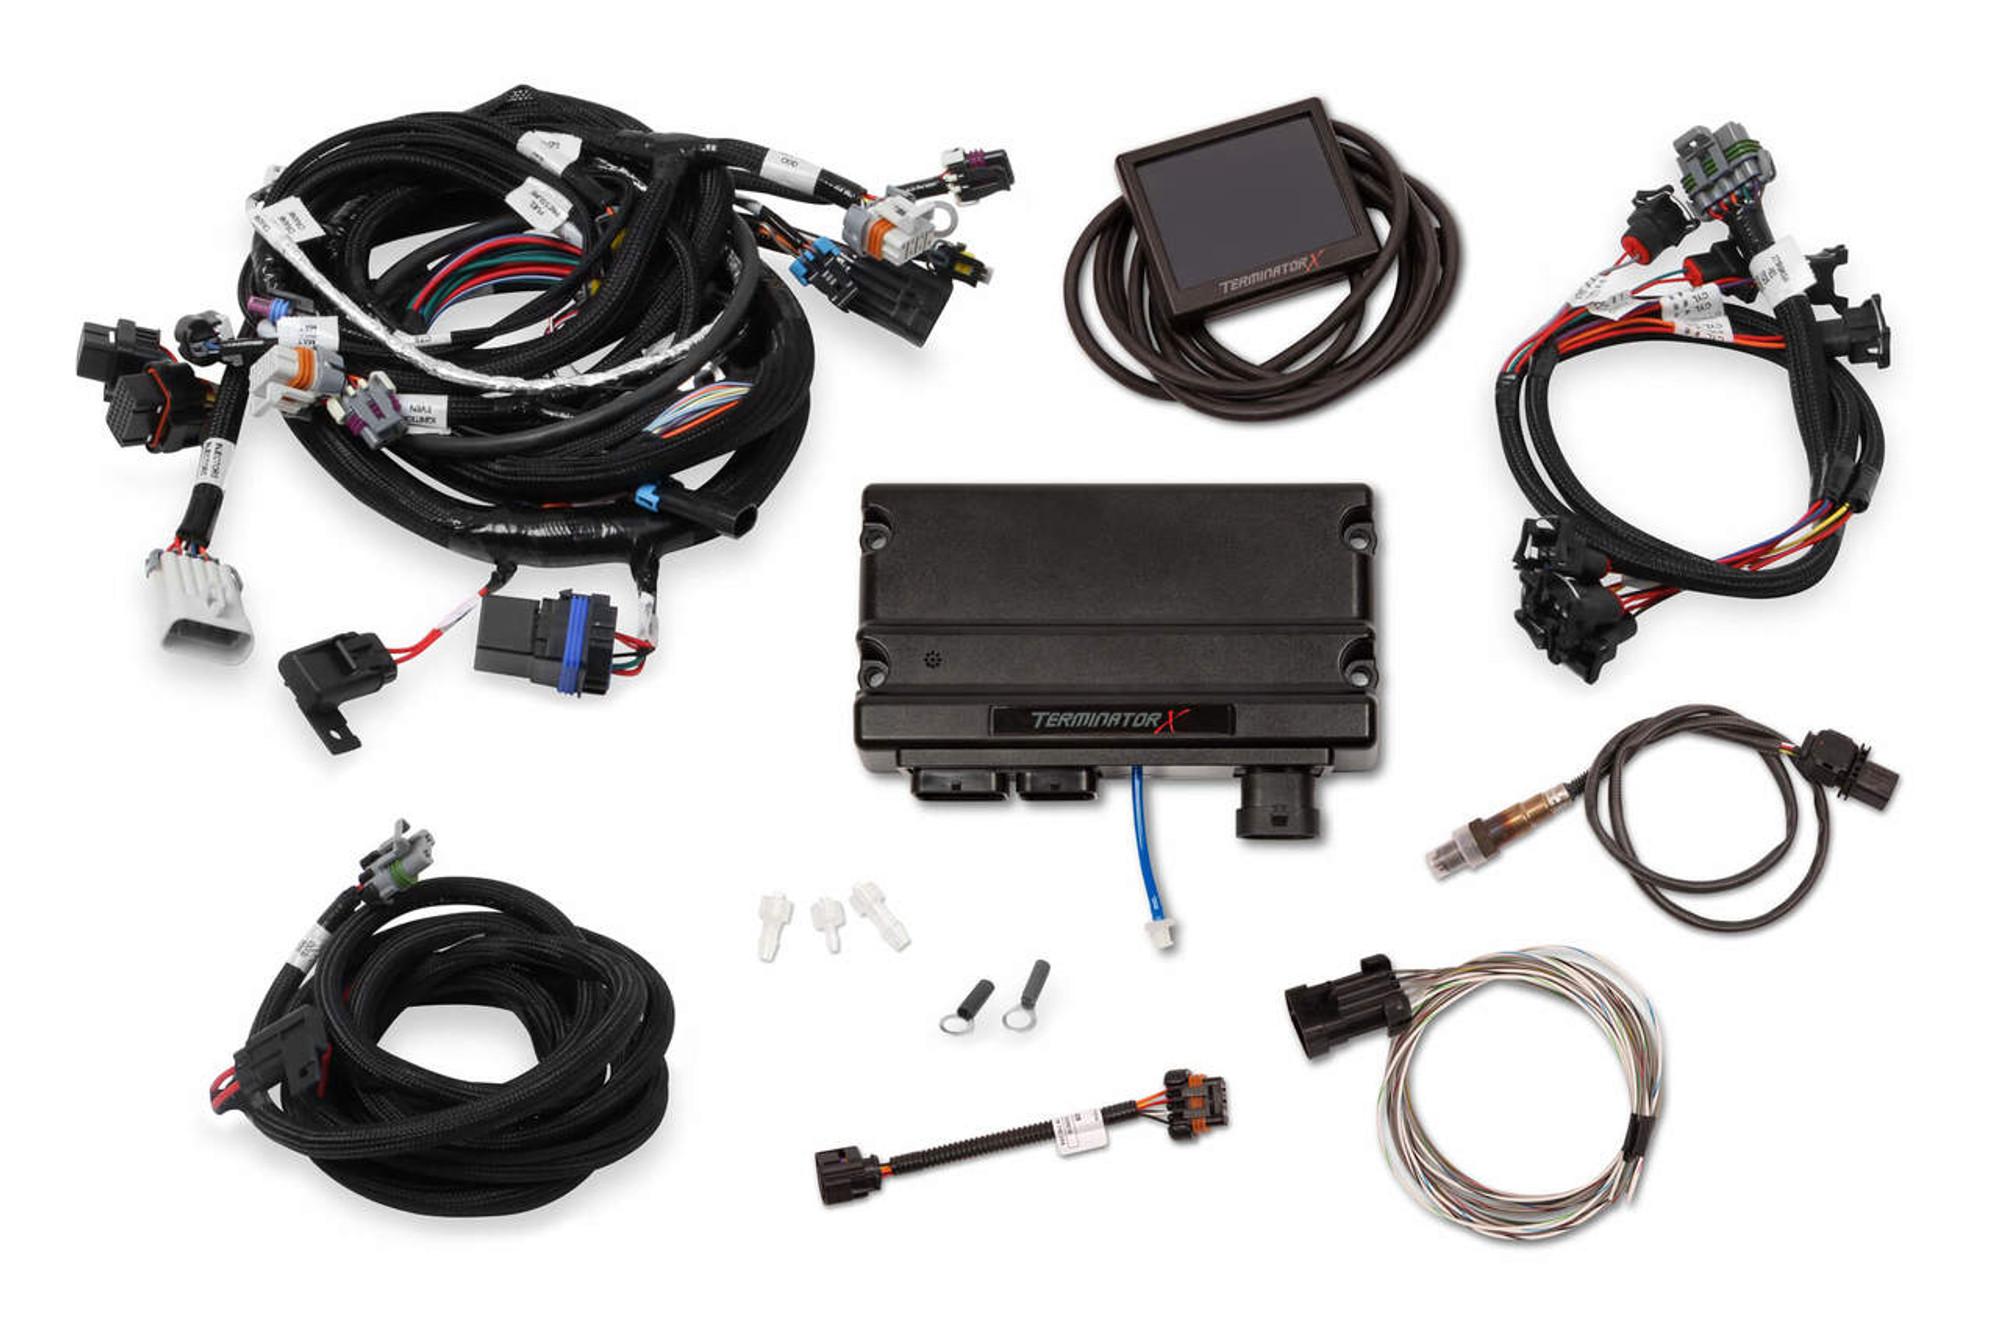 small resolution of holley efi terminator x ls1 24x 1x mpfi kit 550 903